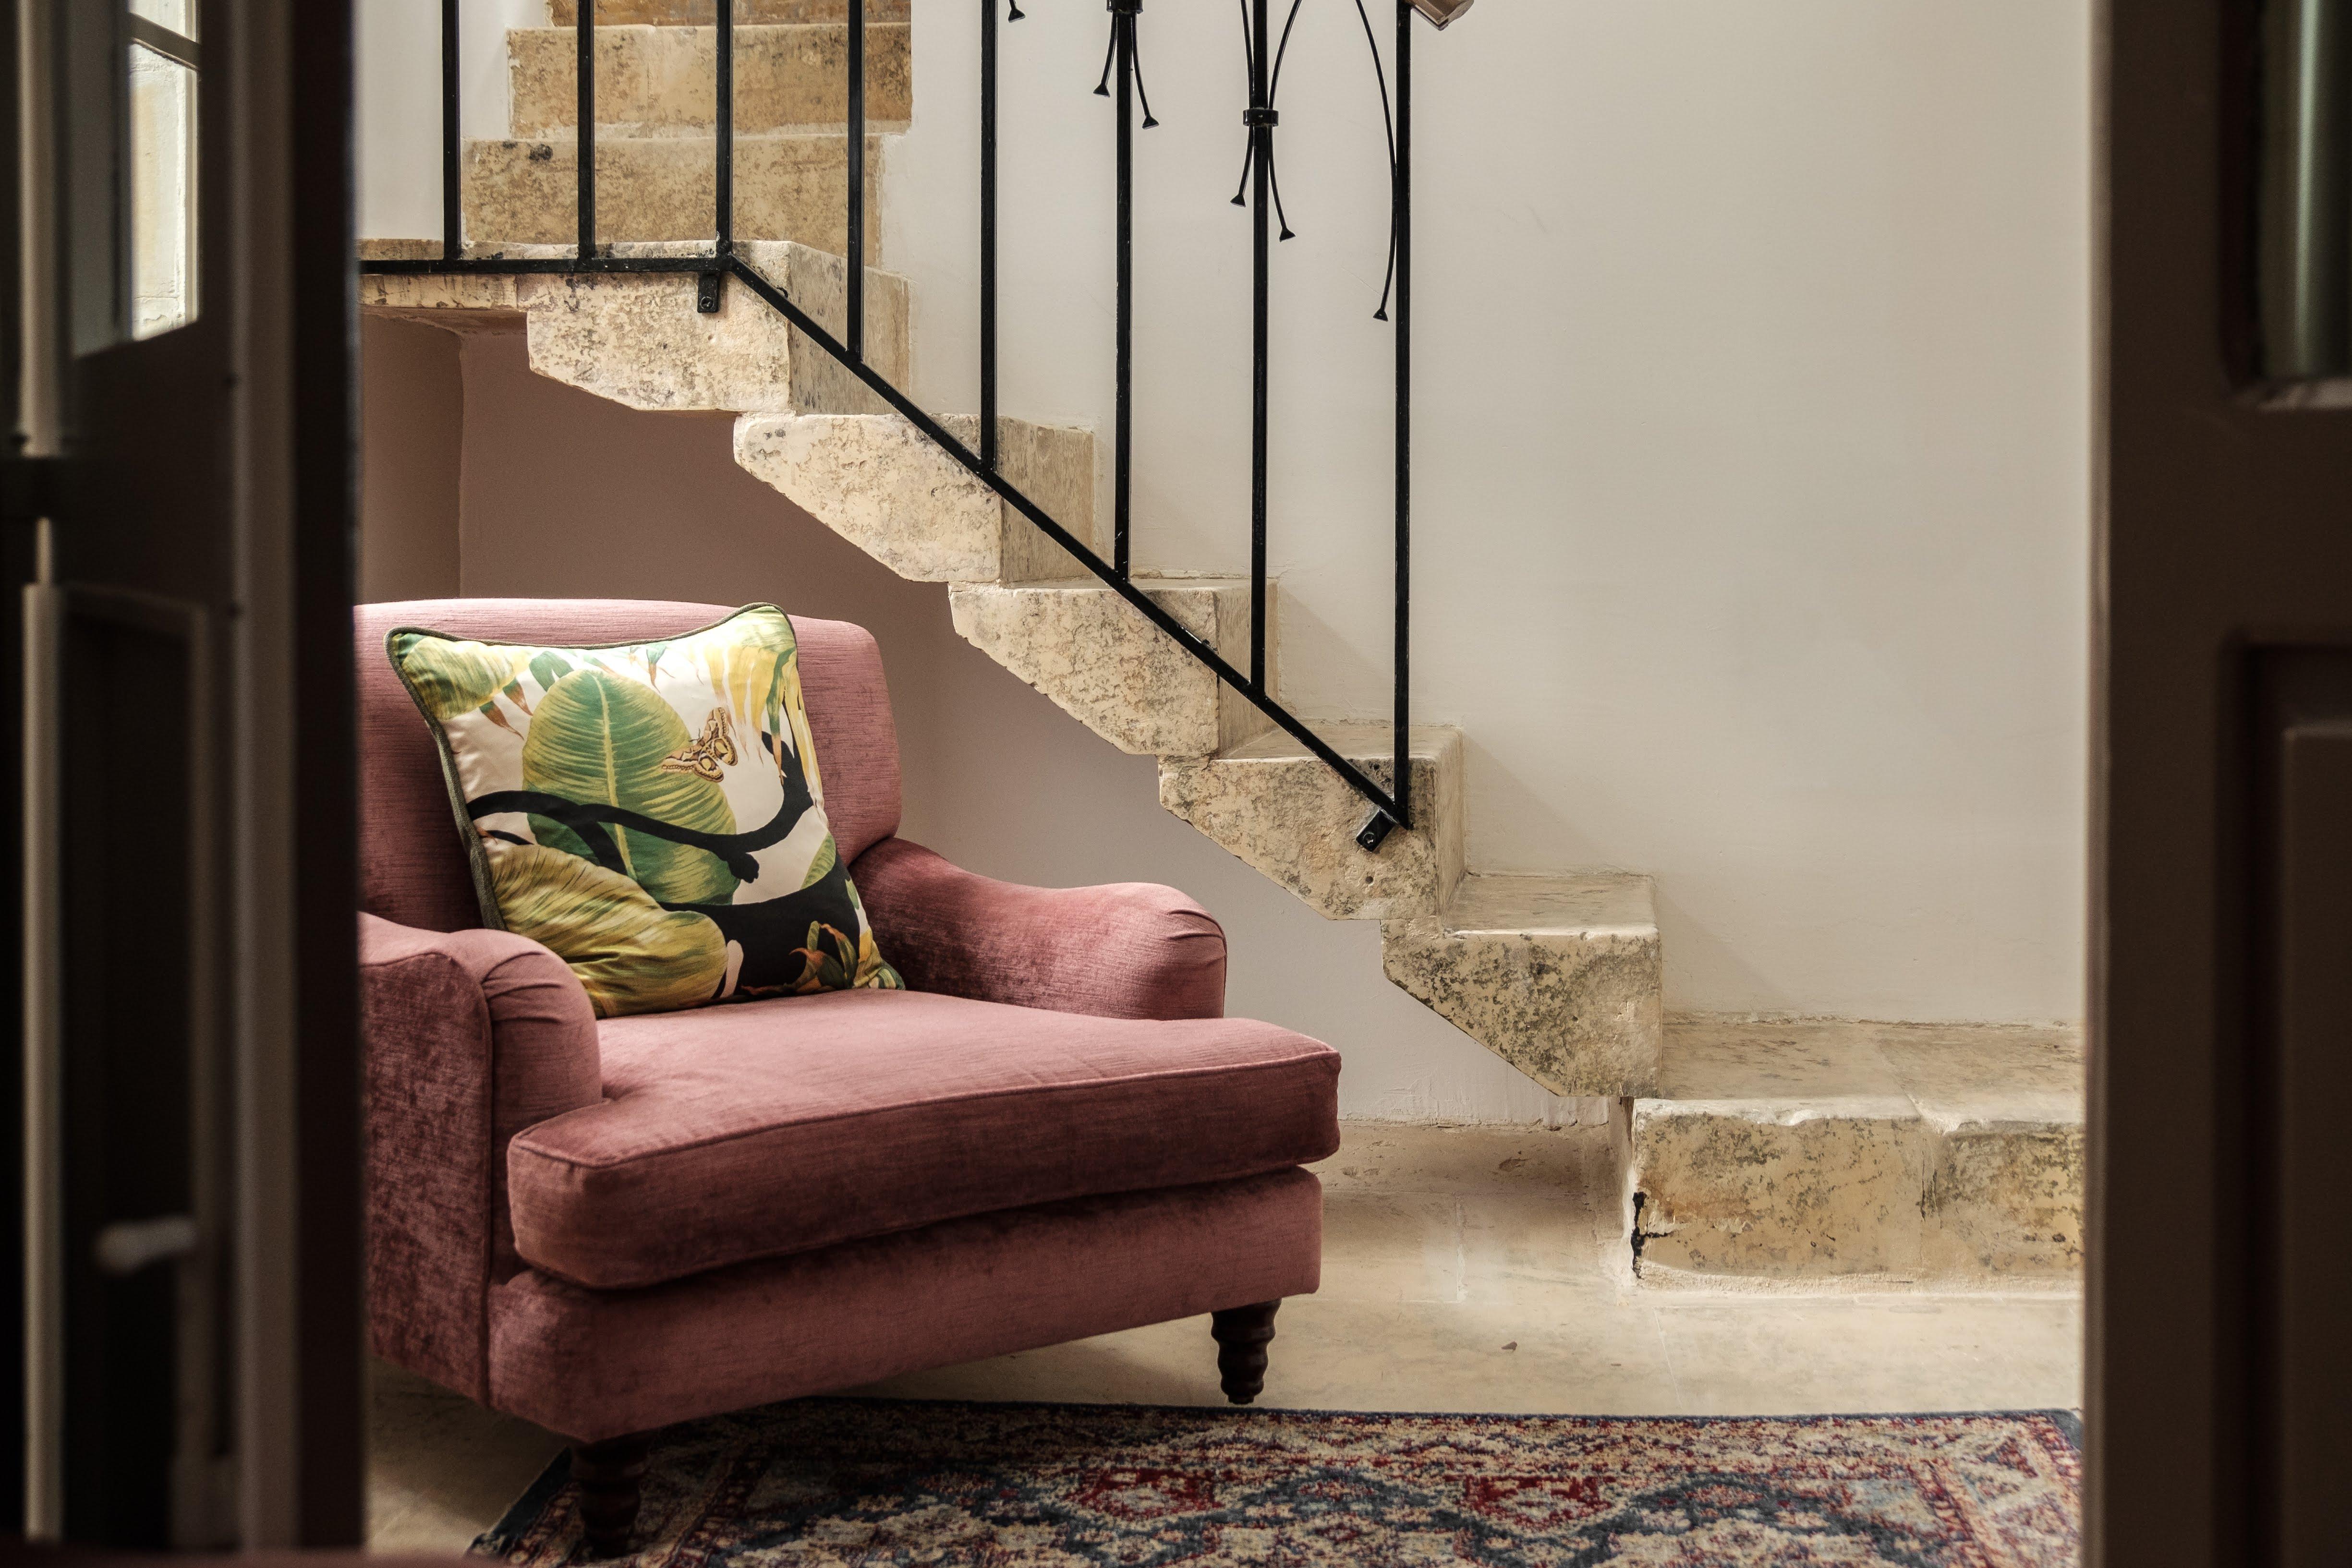 xara-palace-malta-luxury-lustforthesublime